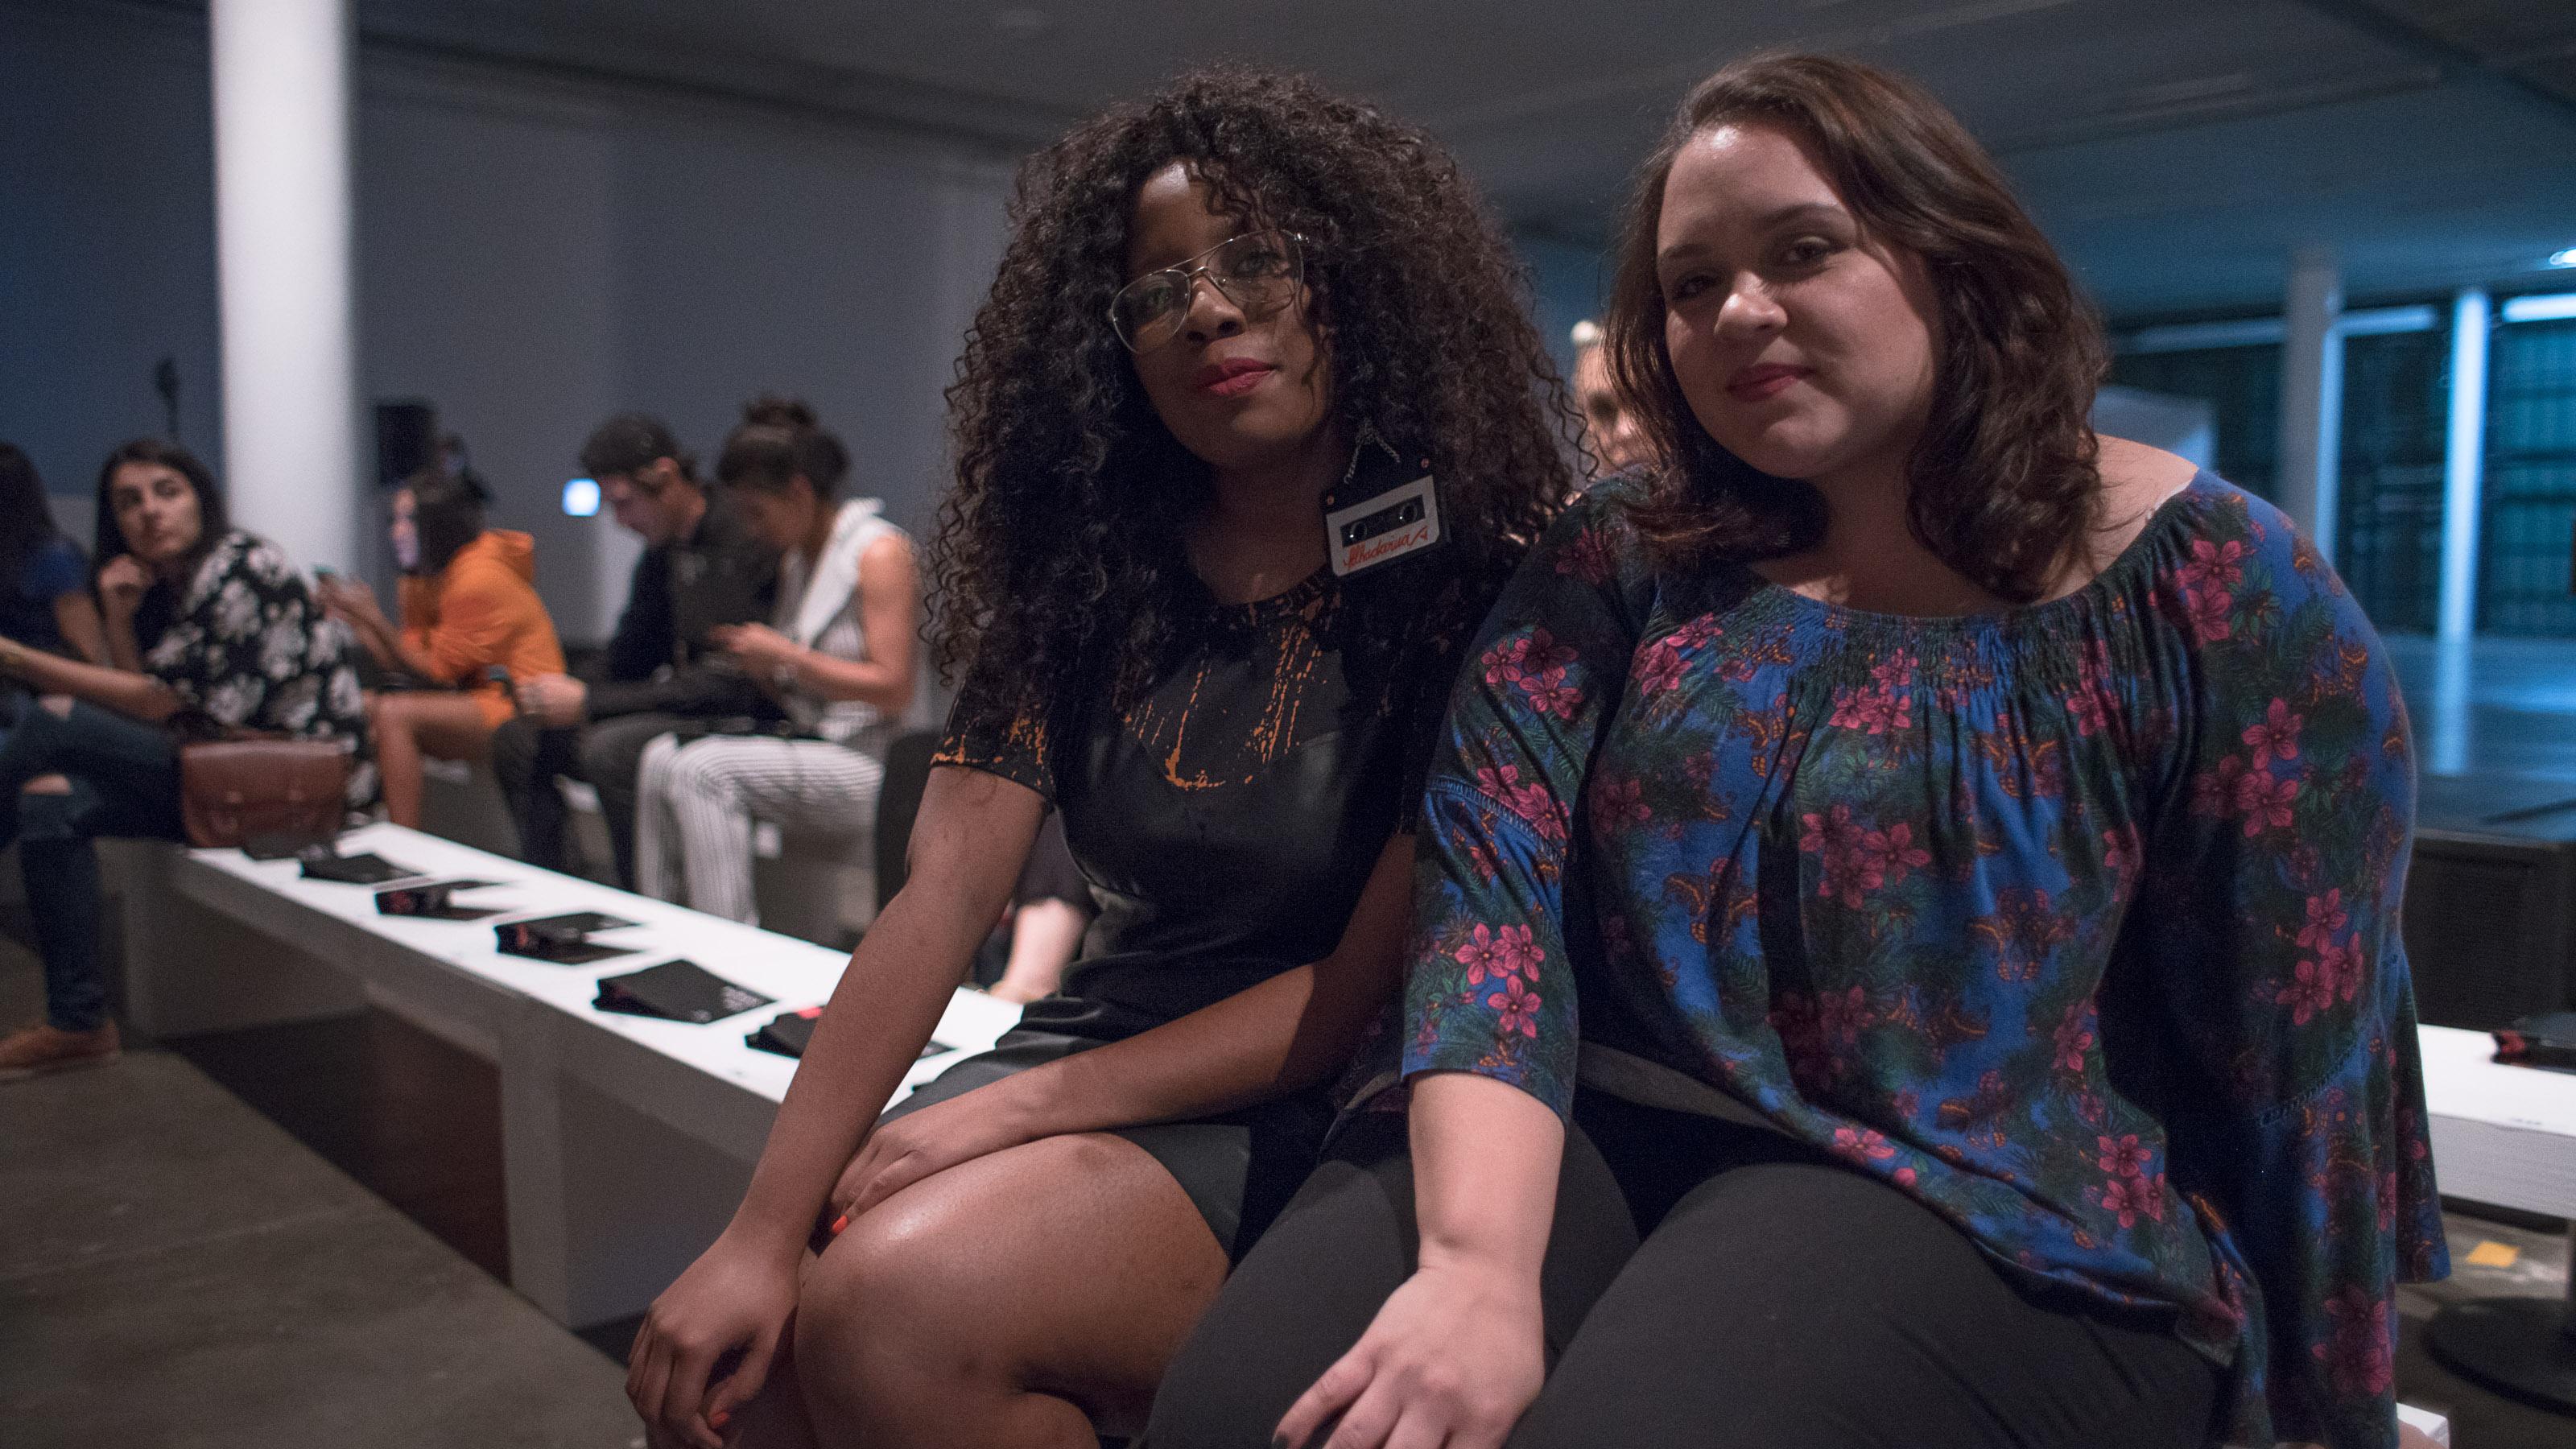 Beatriz e Gabrielle na sala de desfile da LAB (foto: Moysah)